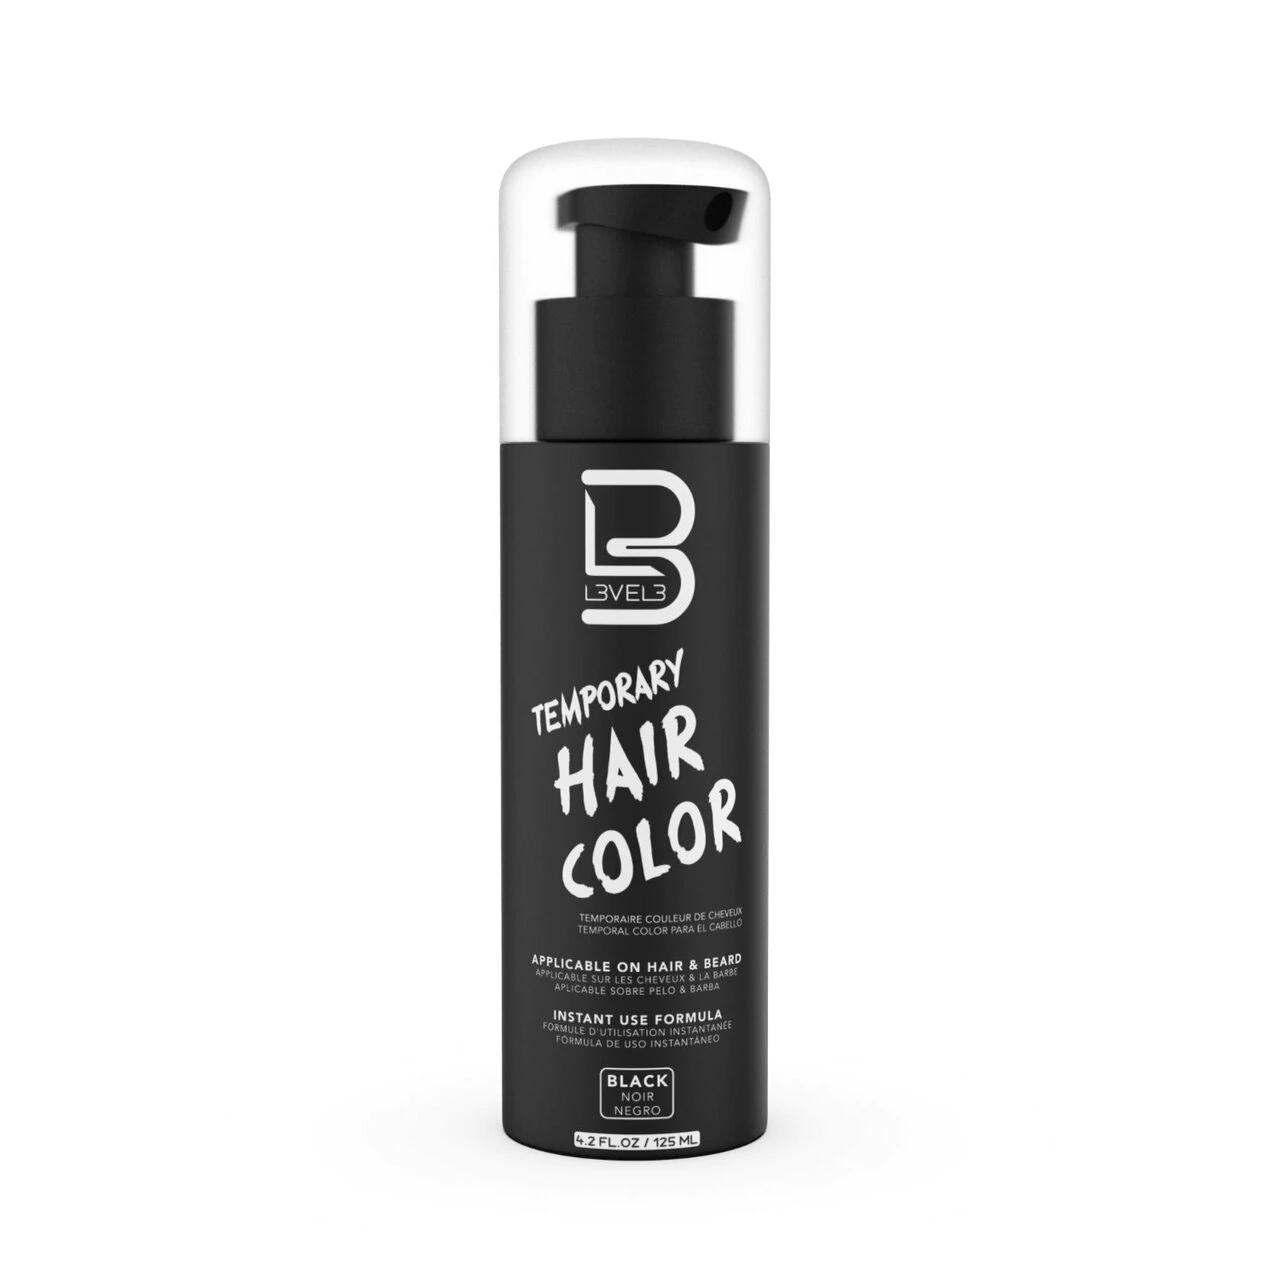 Level3 Beard Color Black